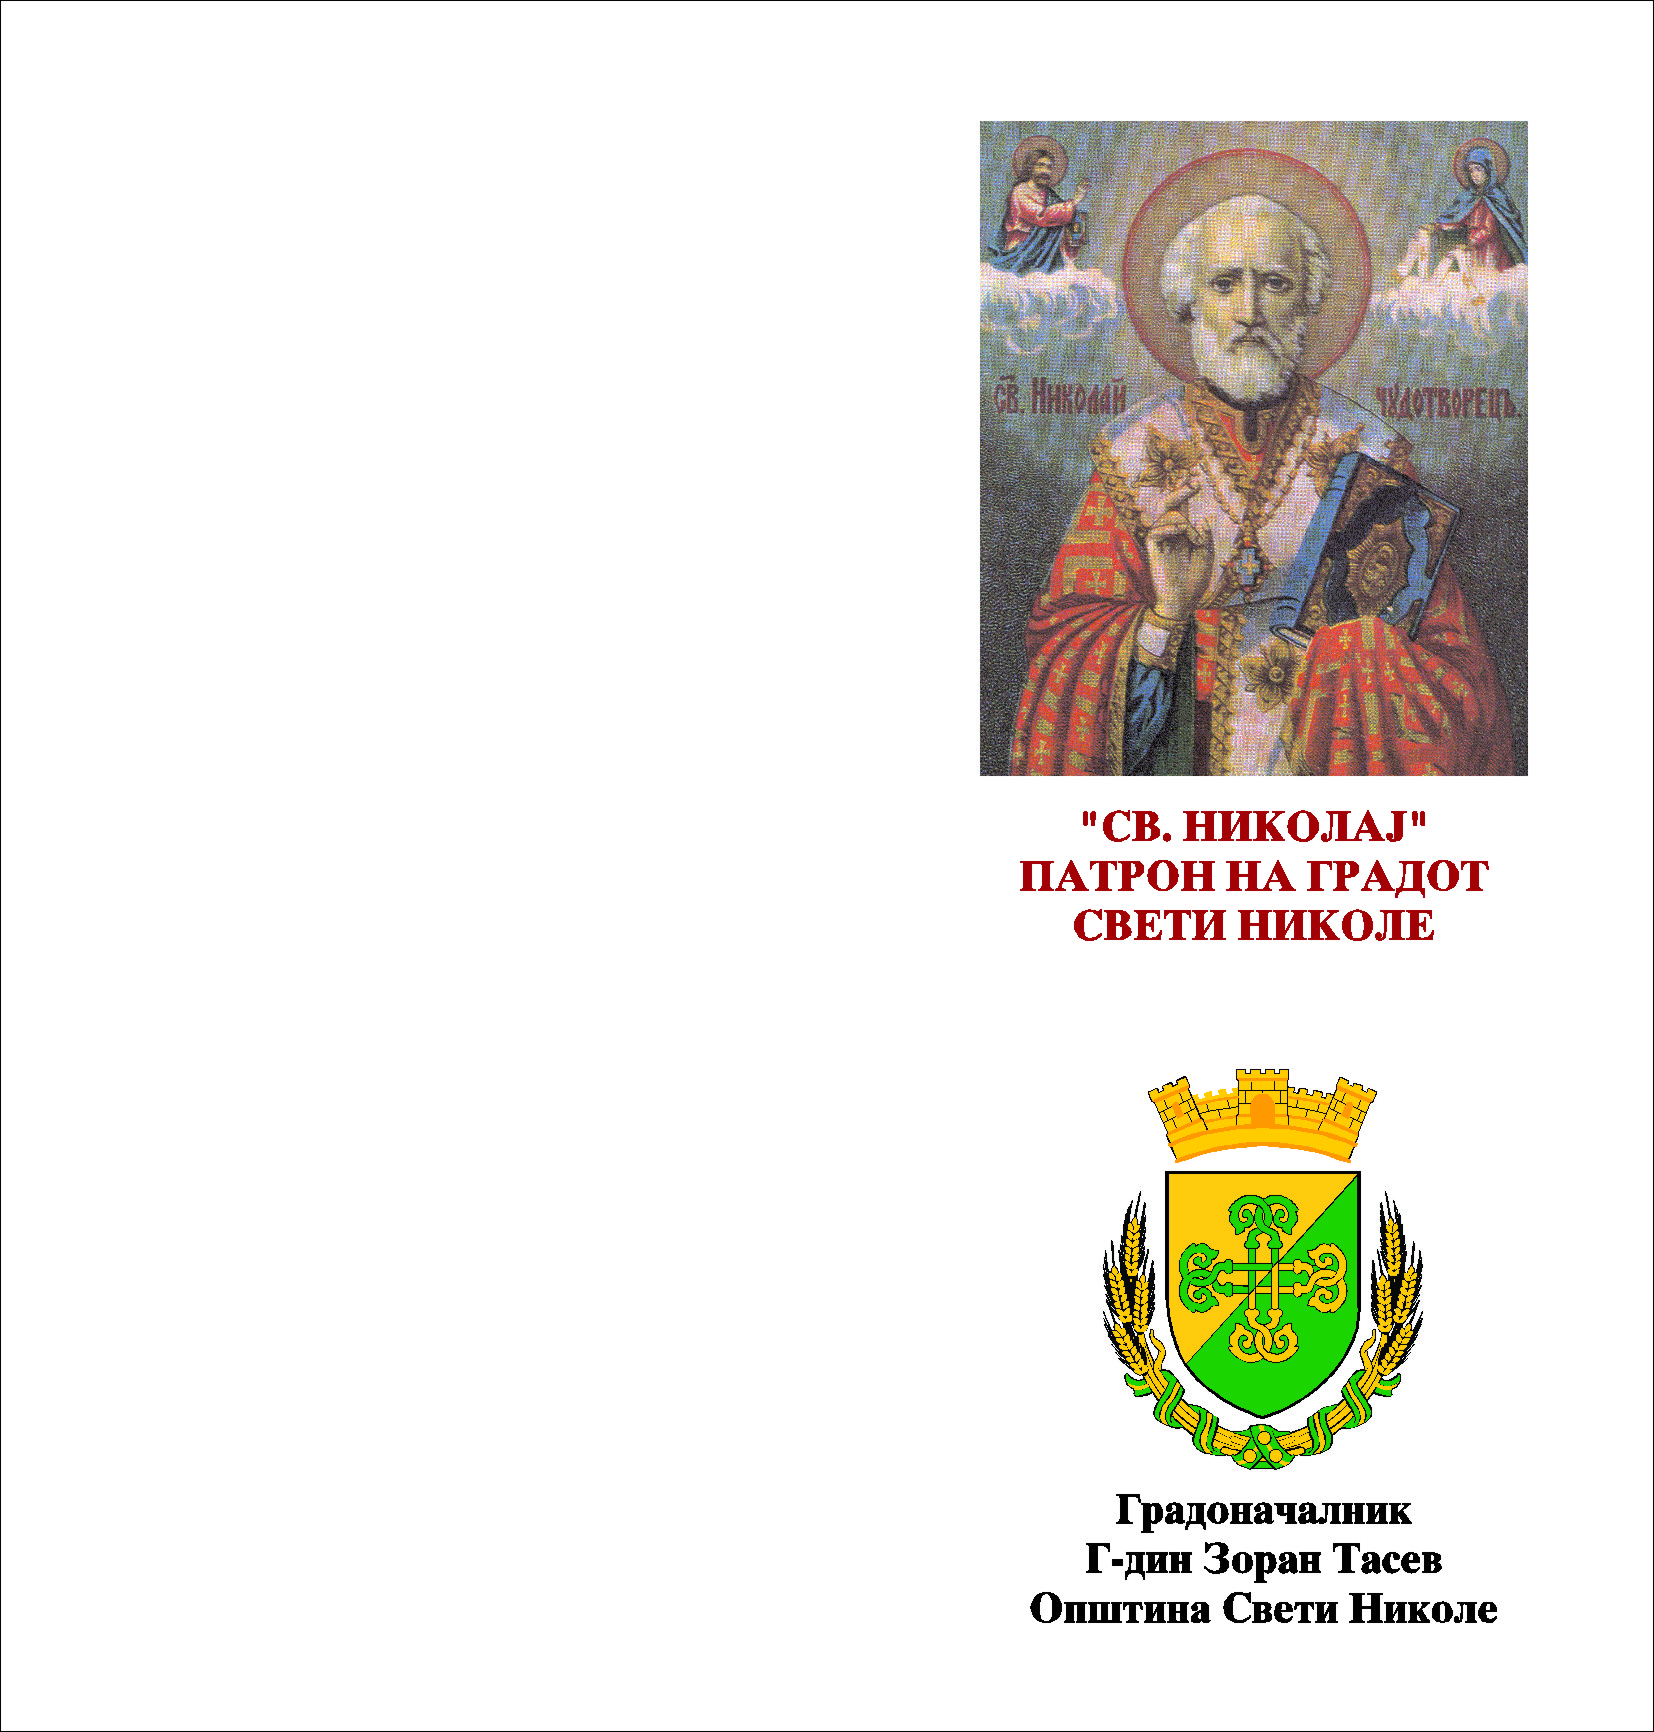 programa Sveti Nikola 1